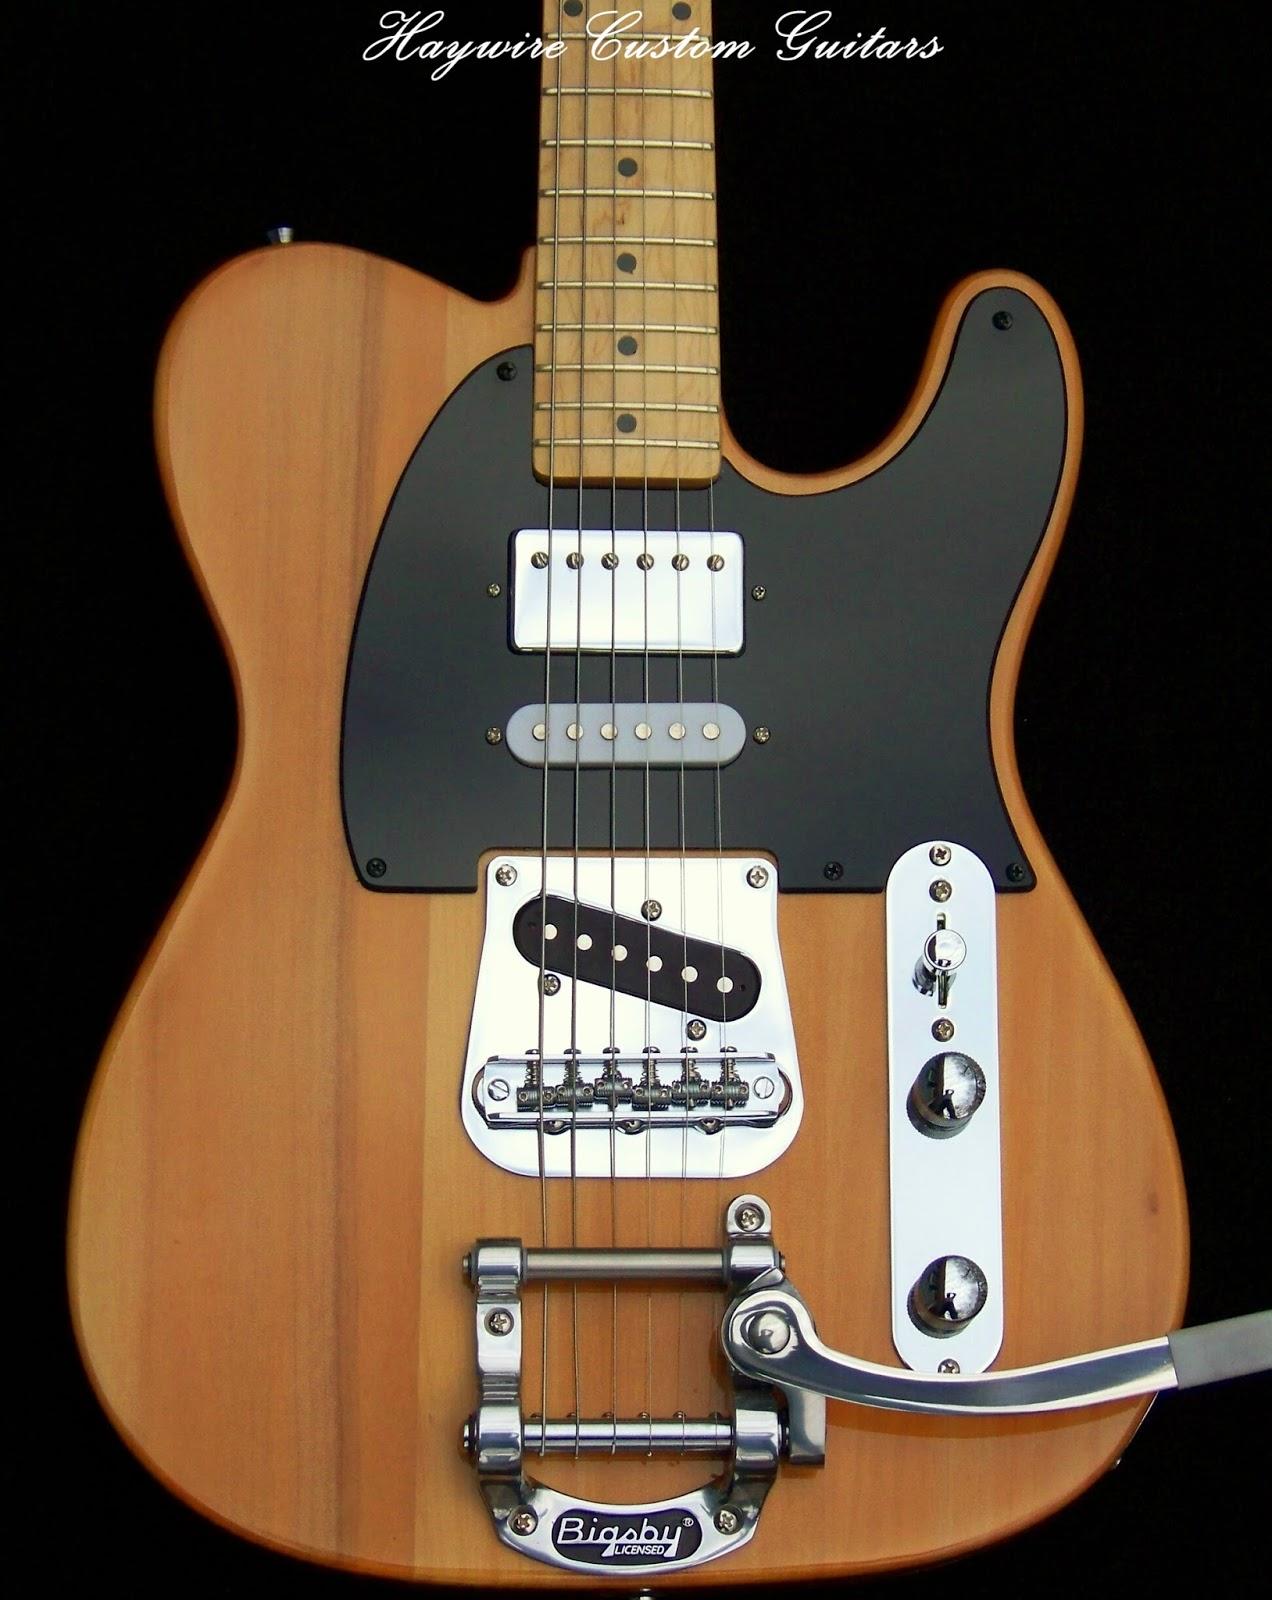 guitar adjustments at haywire custom guitars on all guitars. Black Bedroom Furniture Sets. Home Design Ideas